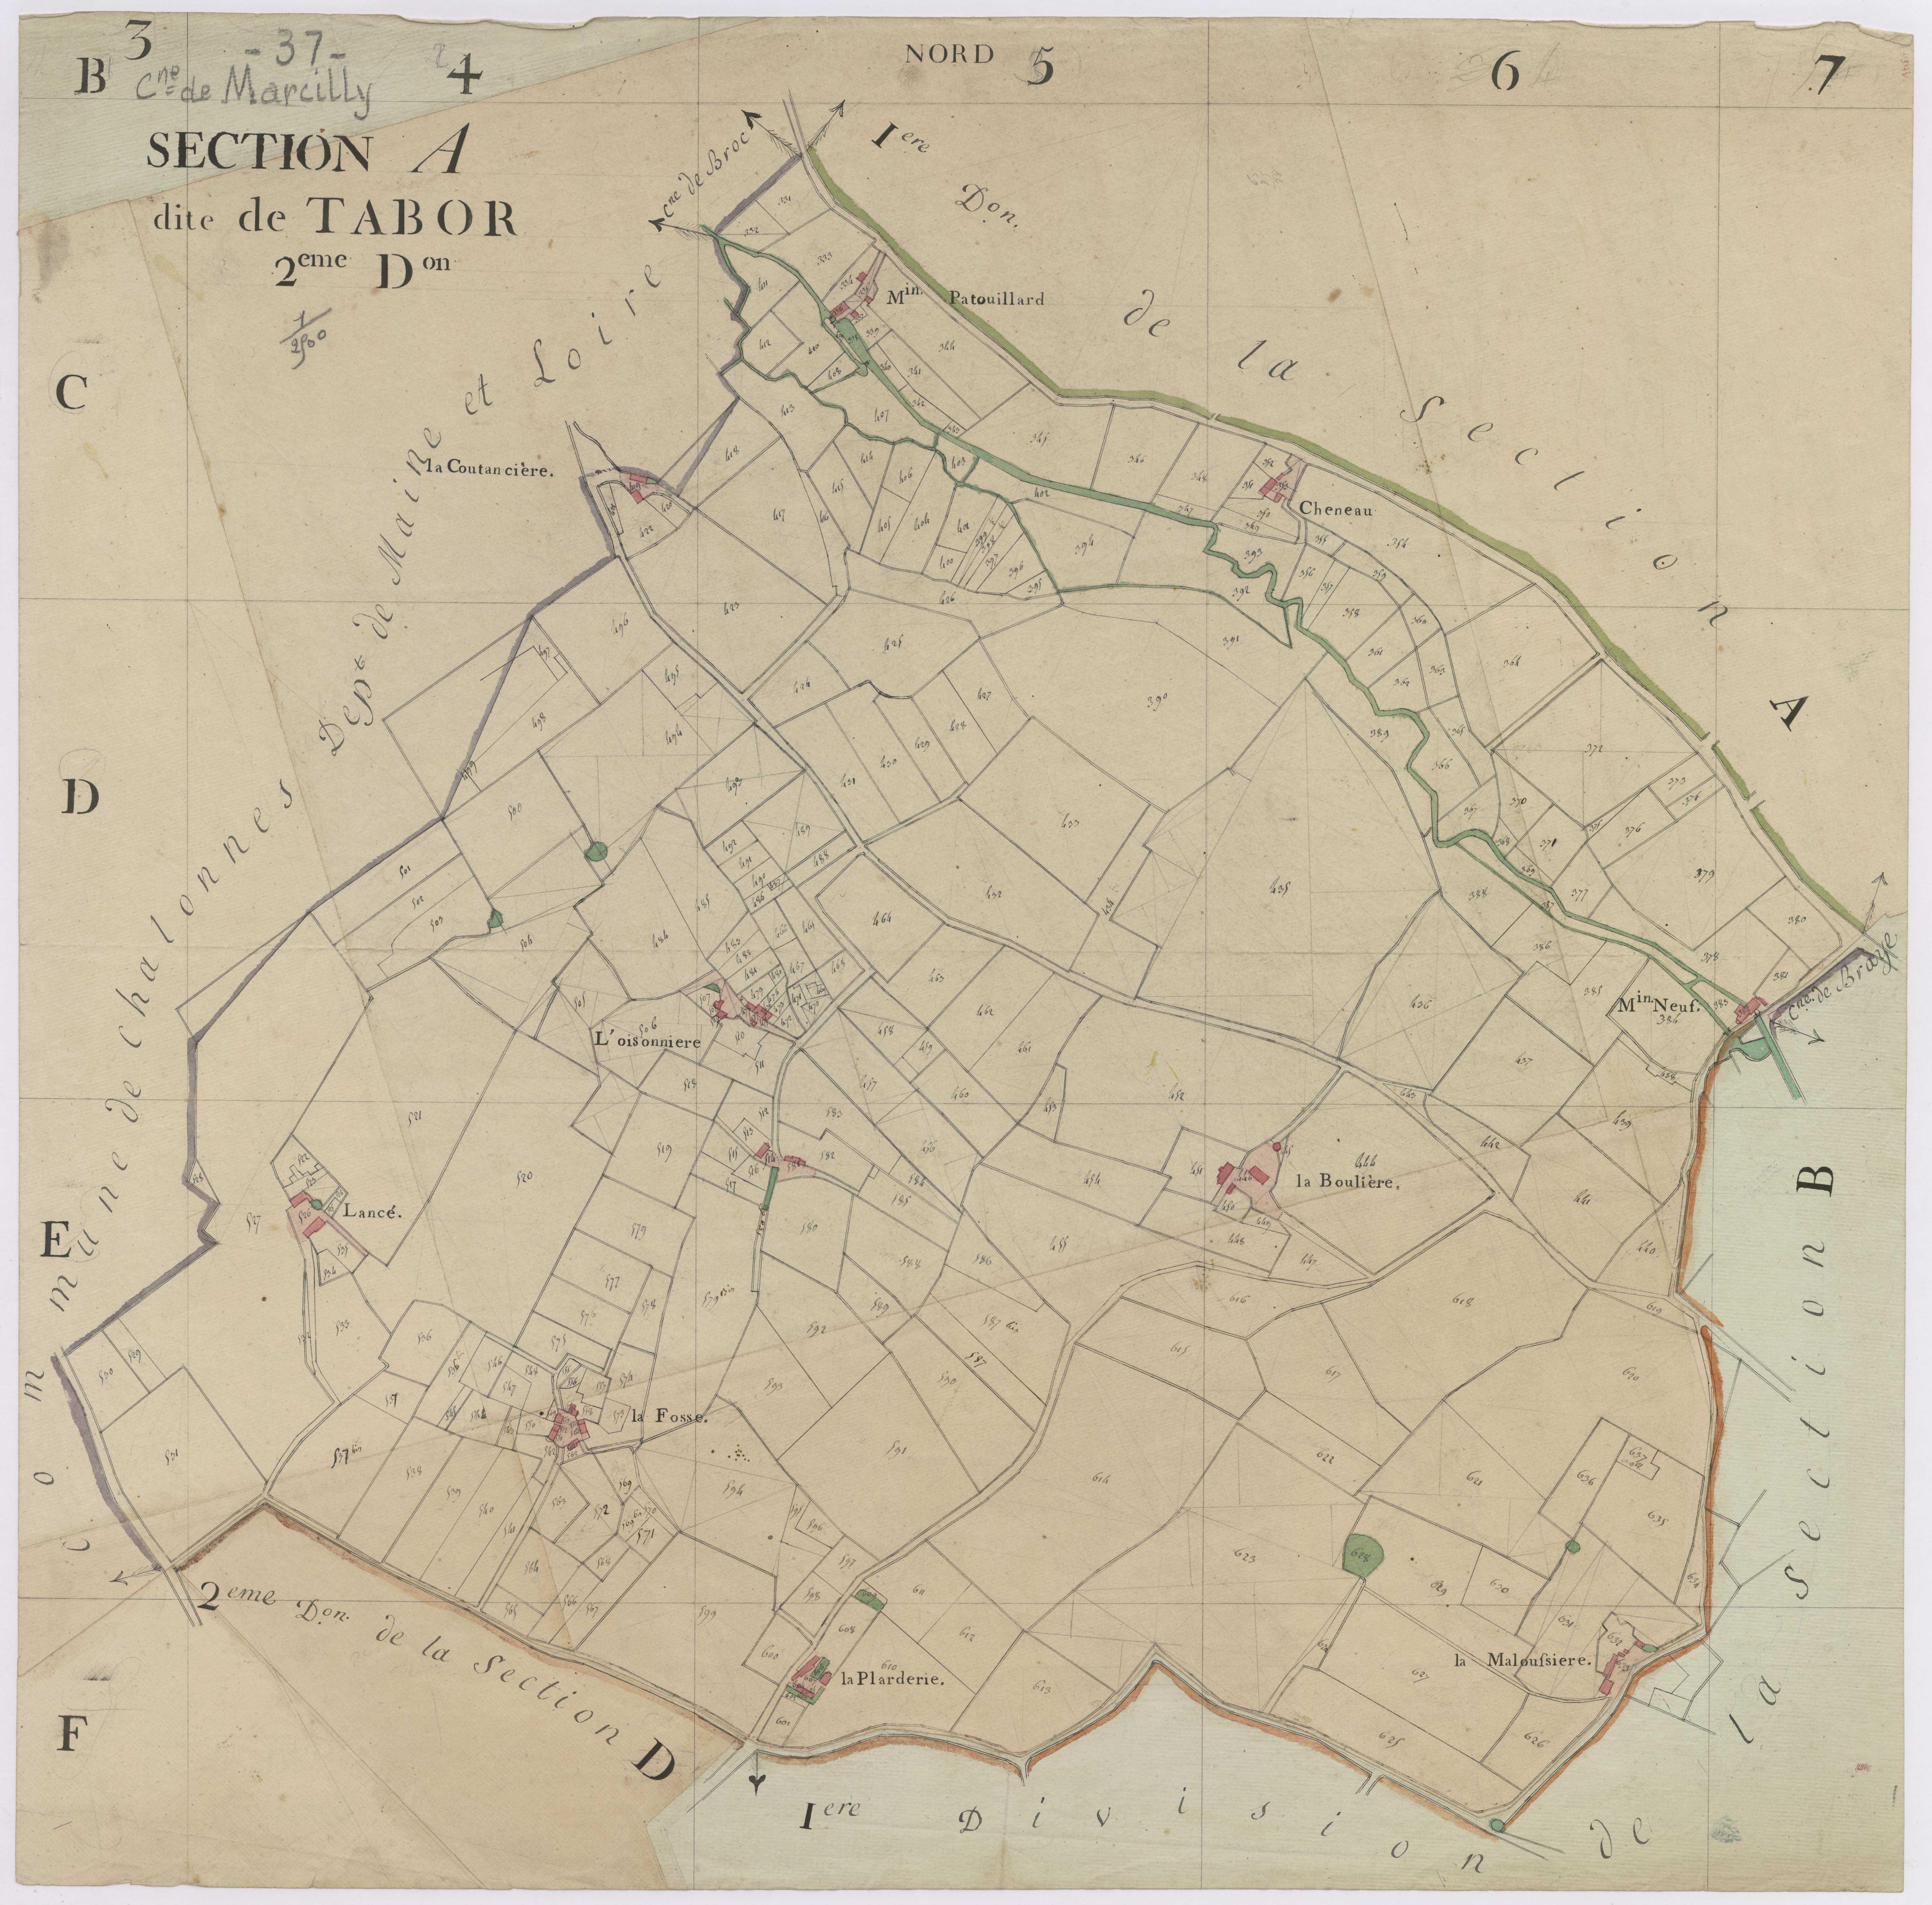 Section A2 de Tabor